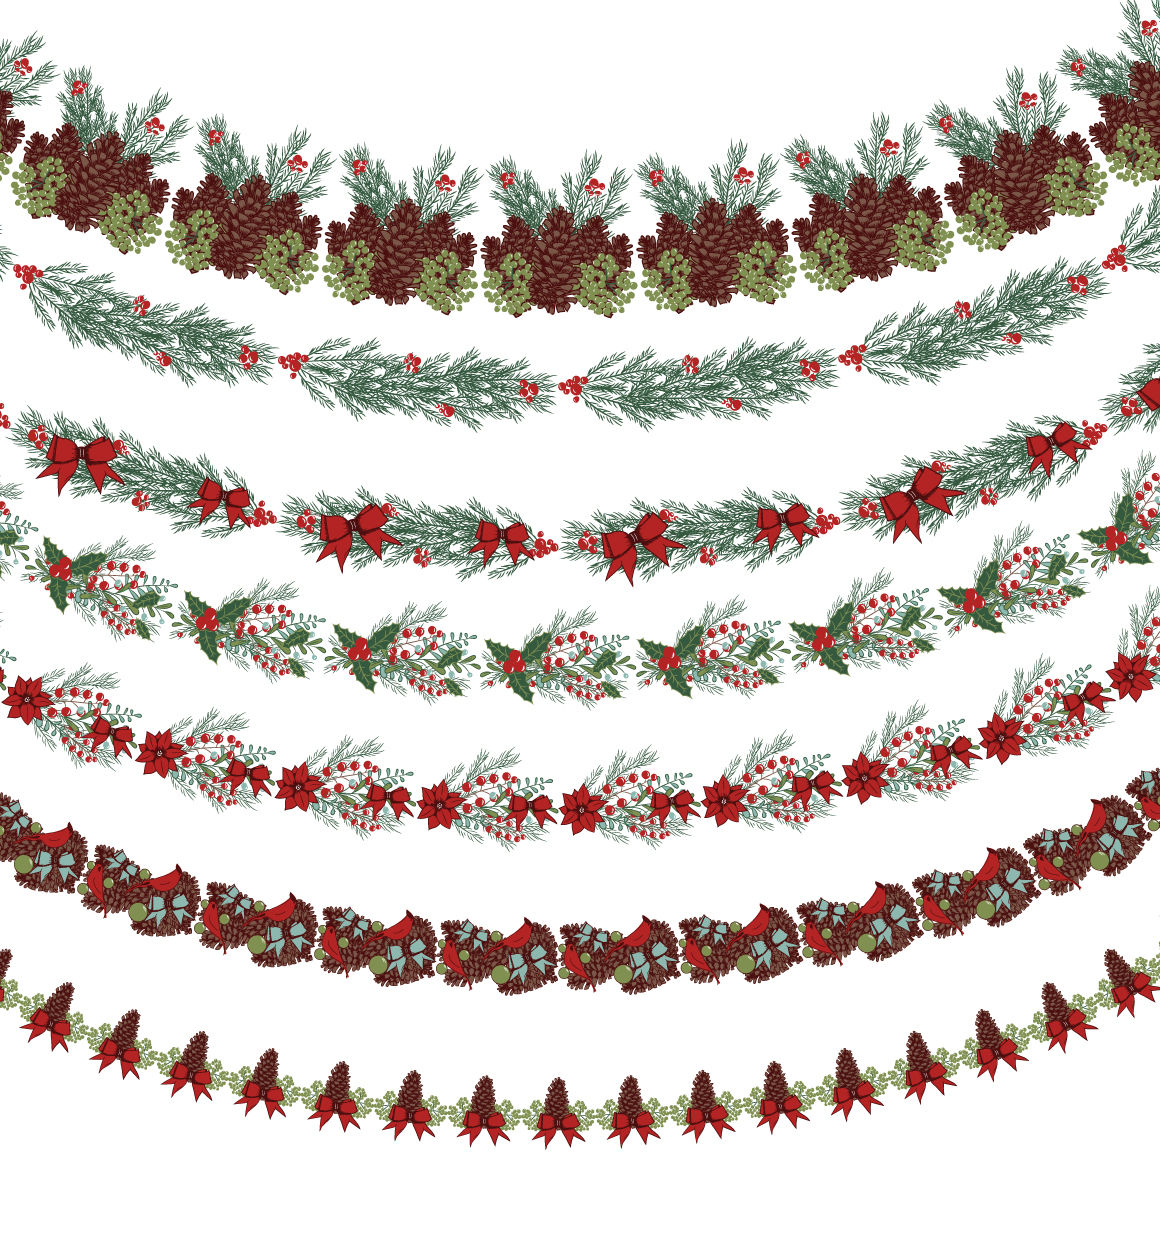 Christmas Wreath Generator By Mm Studio Design Thehungryjpeg Com